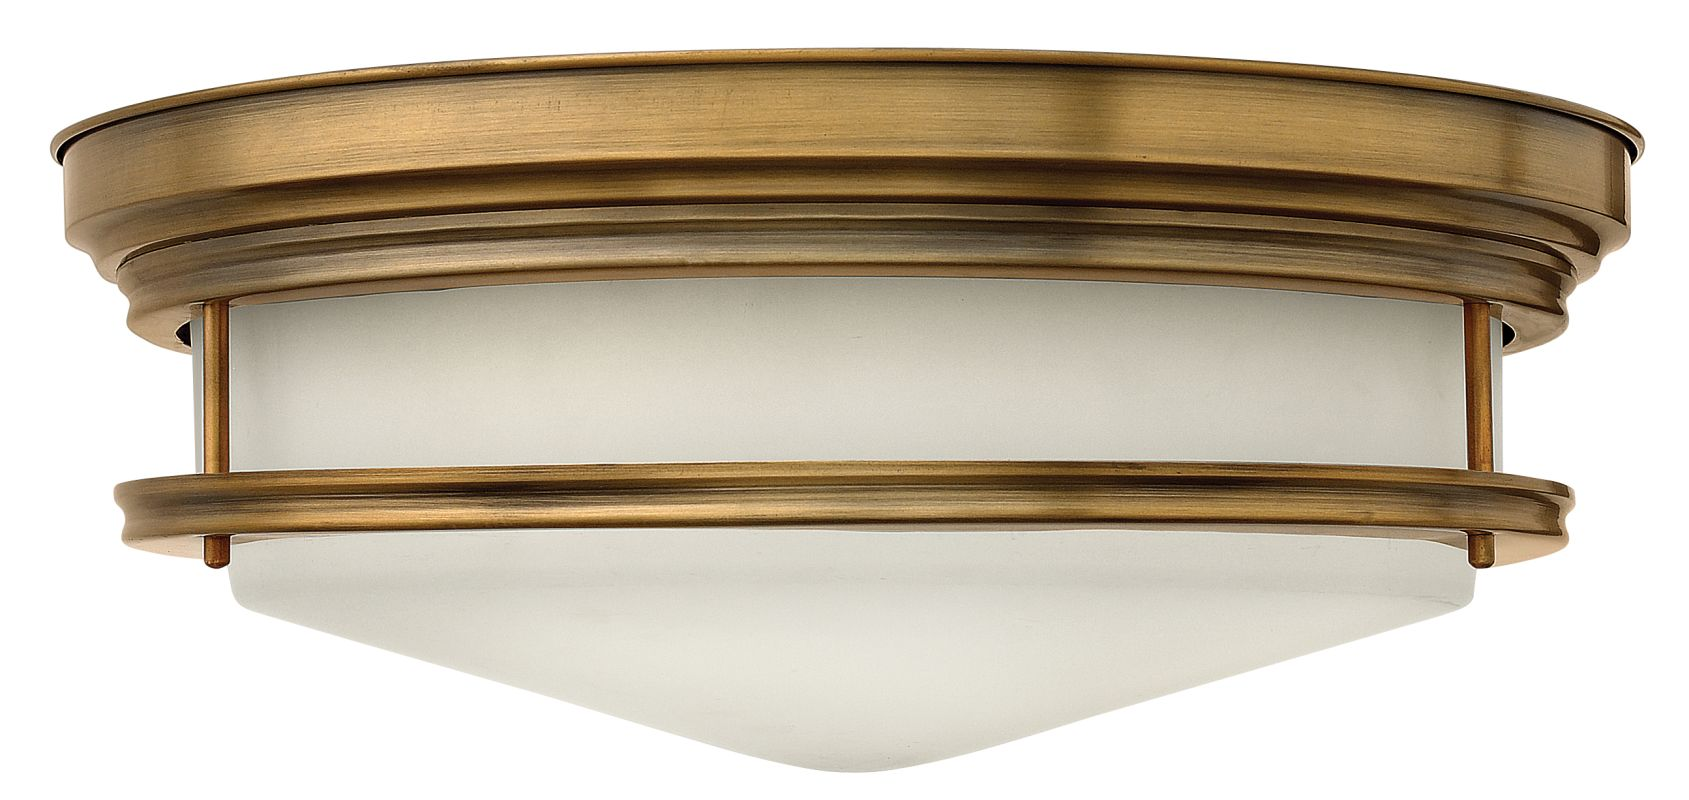 Hinkley Lighting 3304 4 Light Indoor Flush Mount Ceiling Fixture from Sale $399.00 ITEM#: 2173168 MODEL# :3304BR UPC#: 640665330410 :